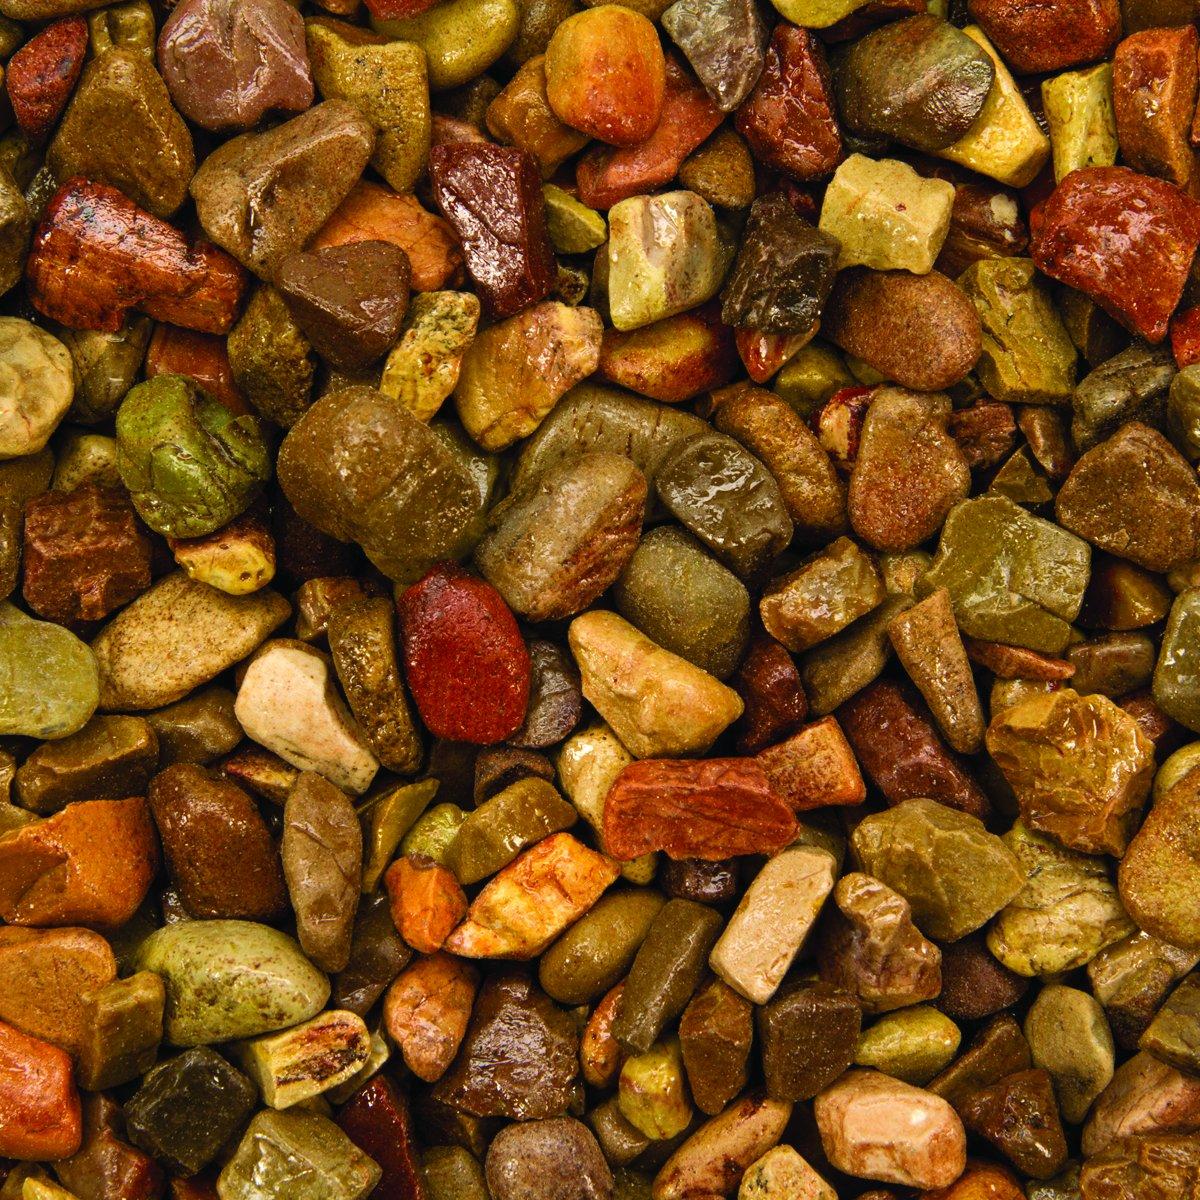 Cherokee Pebble 5 lb Cherokee Pebble 5 lb Clifford W Estes Products Gravel, Cherokee Pebble, 5 lb